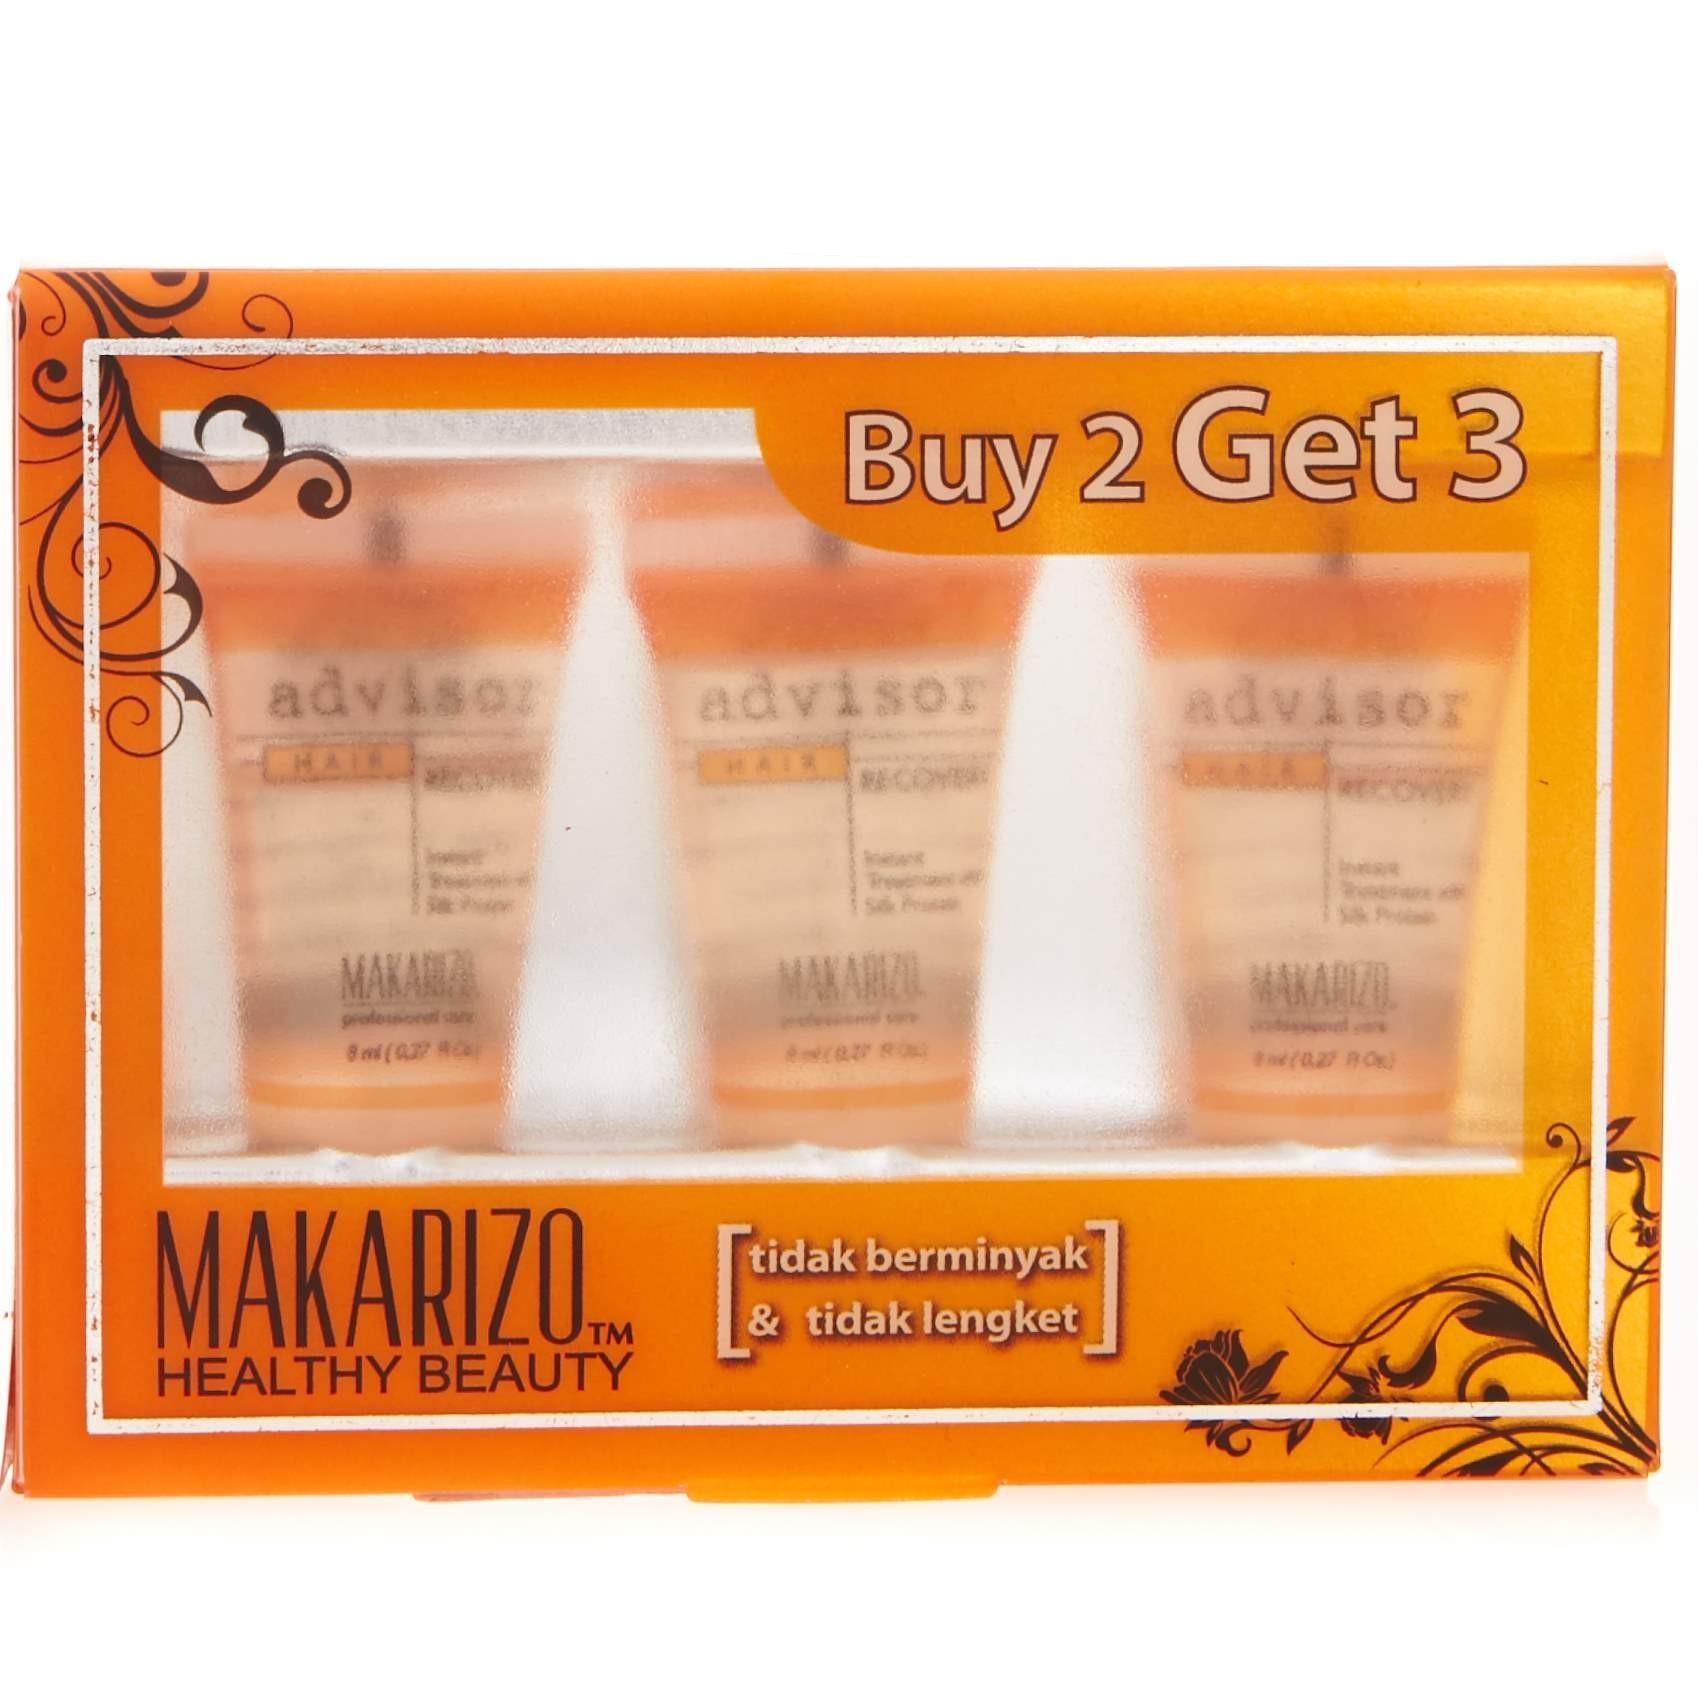 MAKARIZO Advisor Hair Recovery Set 3x8Ml